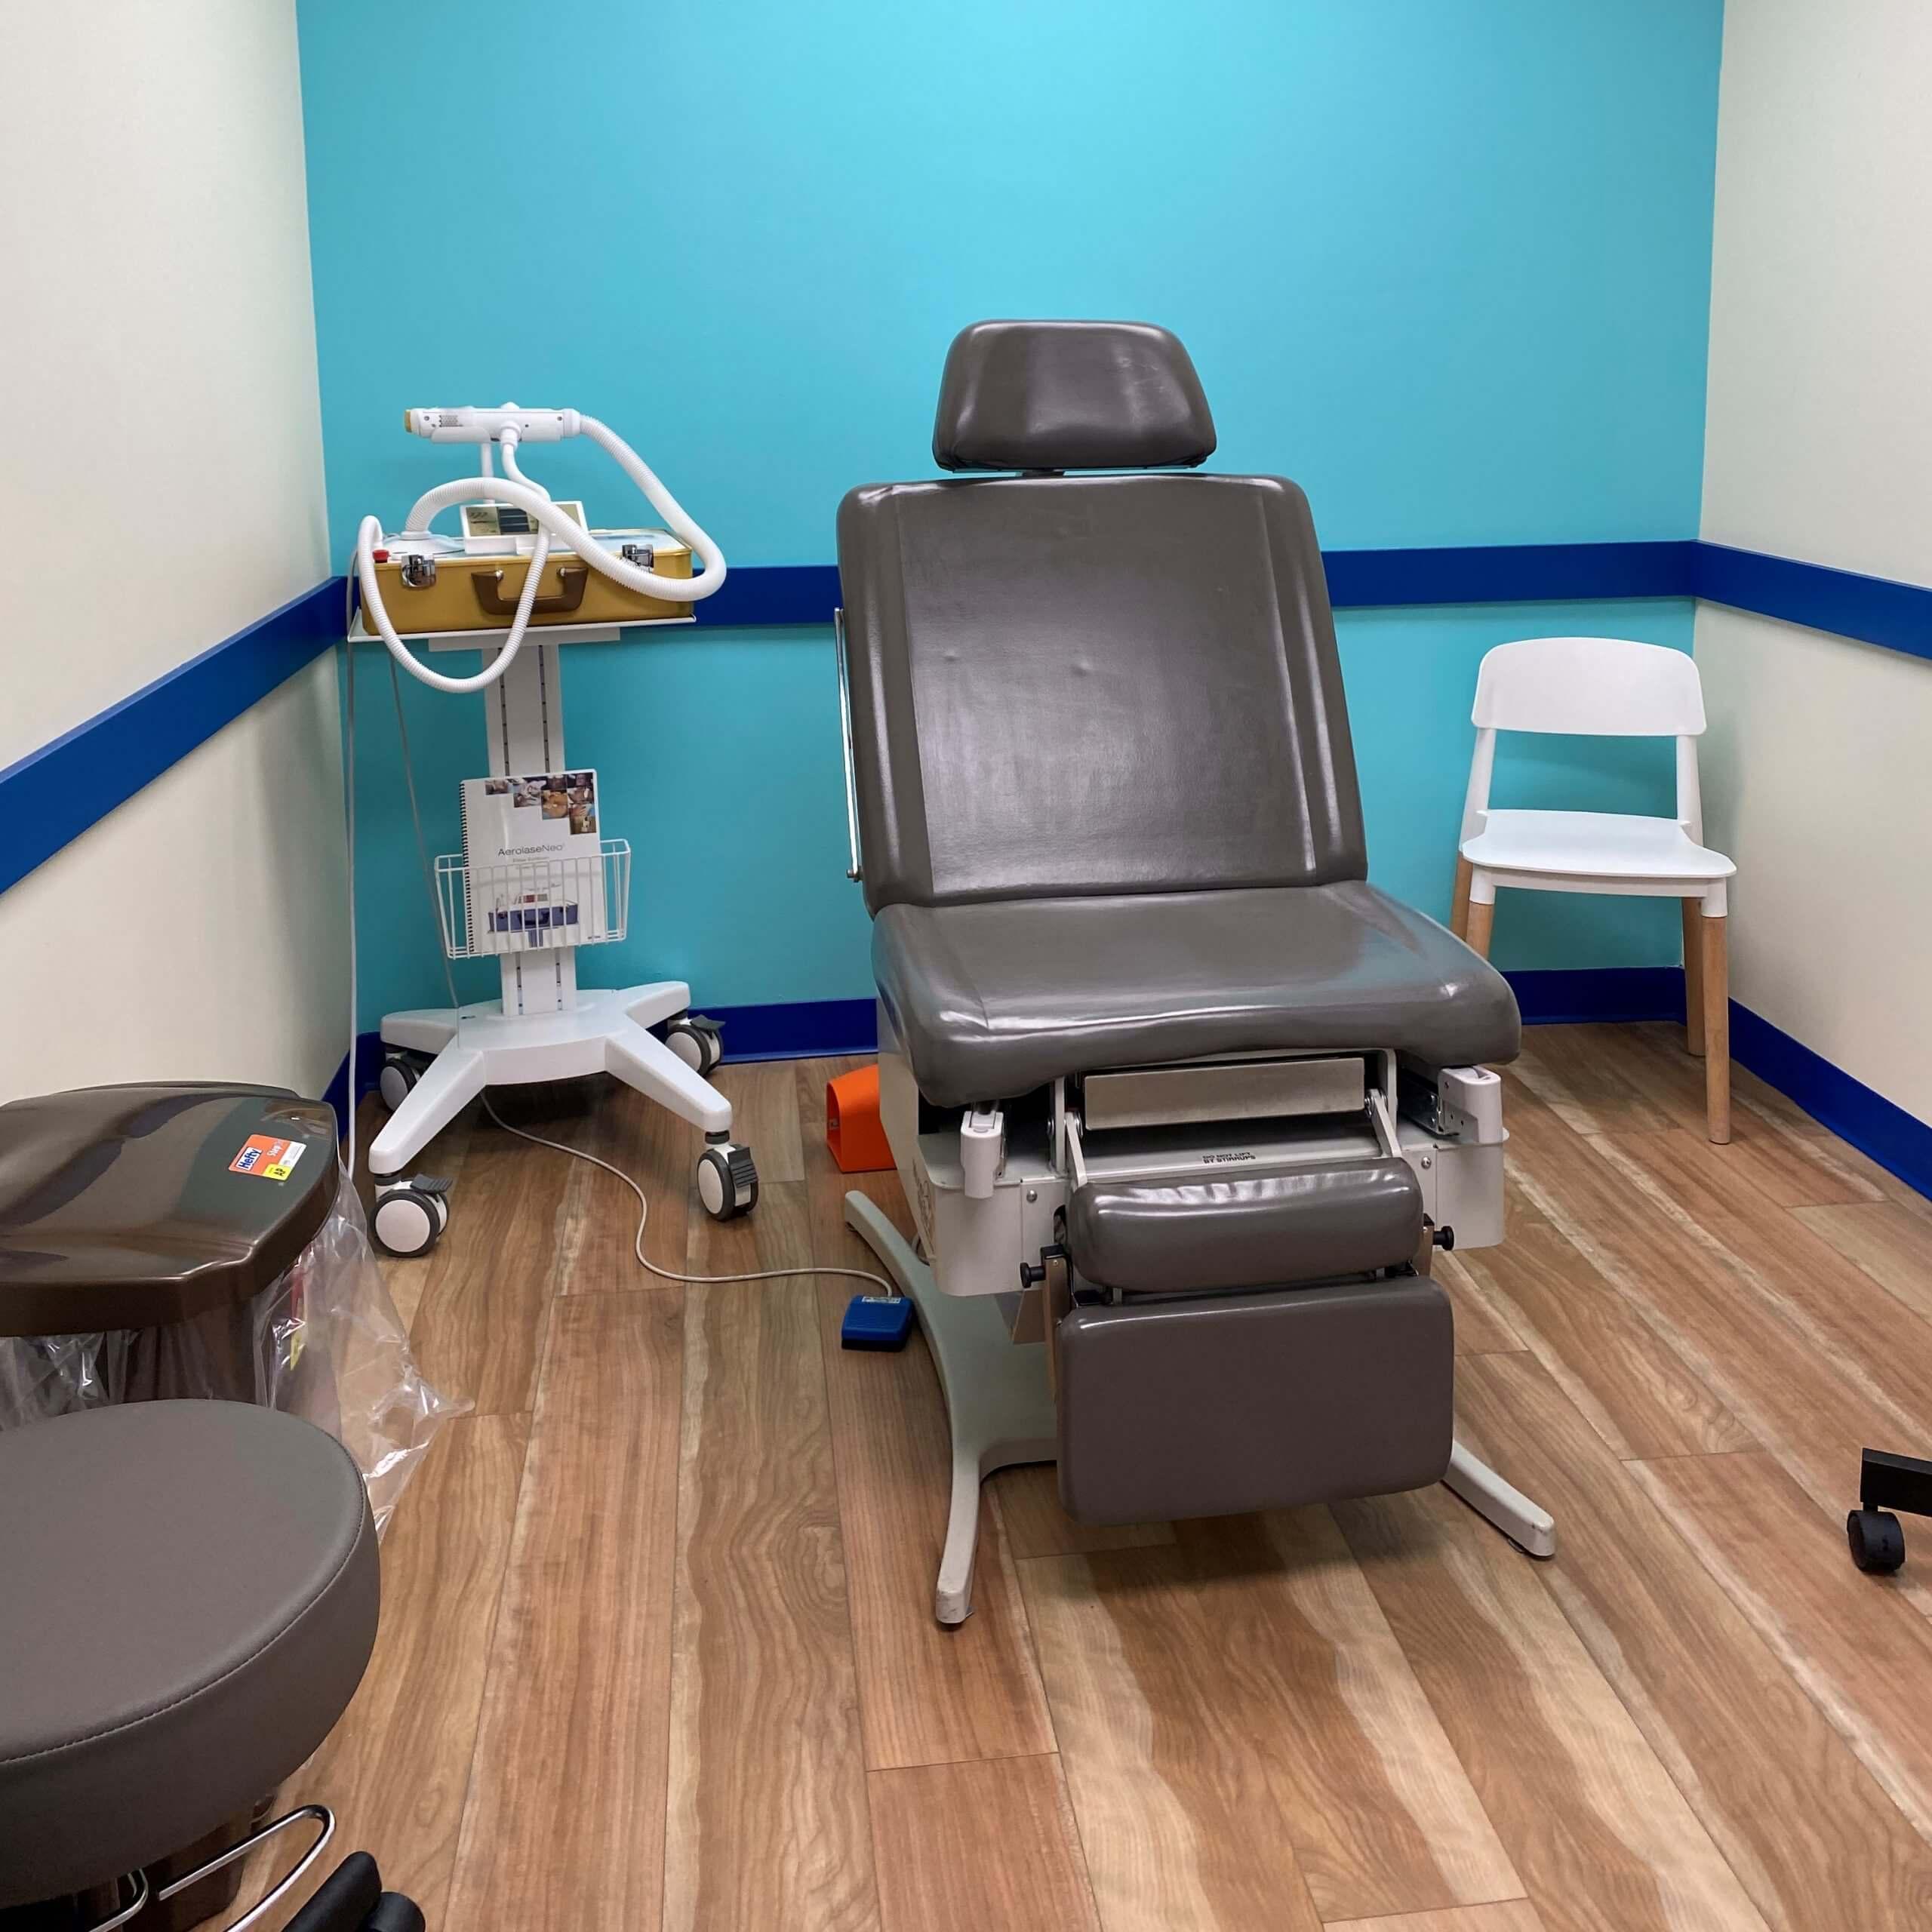 Clinic Exam Room 2